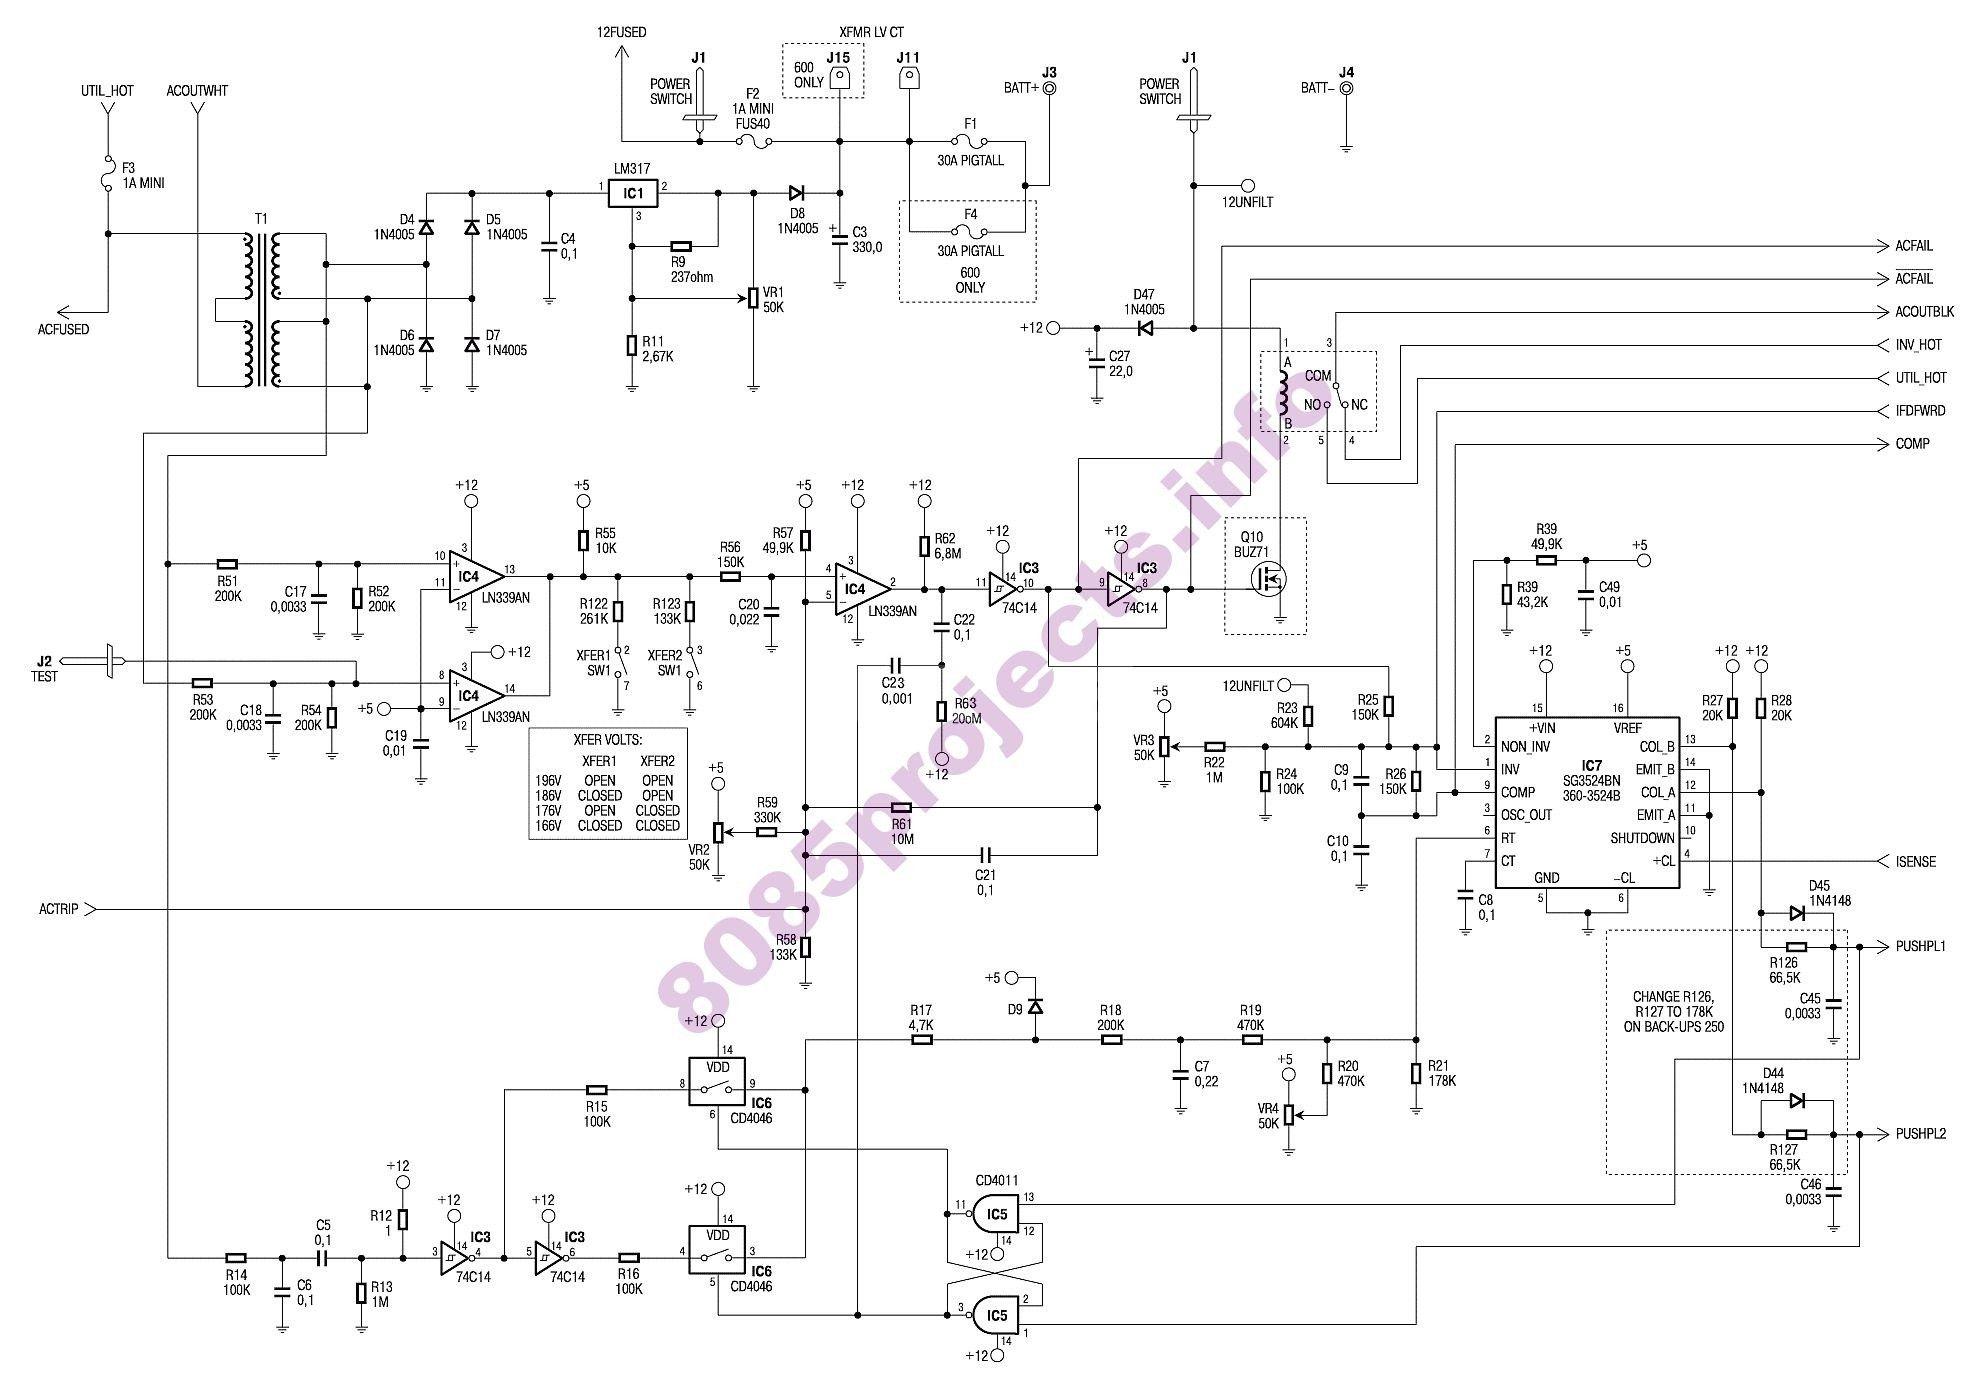 [DIAGRAM_0HG]  HH_7587] Ot Wiring Diagram For Apc Ups Battery Rbc33 Motherboard Forums Wiring  Diagram | Apc Rbc32 Battery Wiring Diagram |  | Genion Hyedi Mohammedshrine Librar Wiring 101